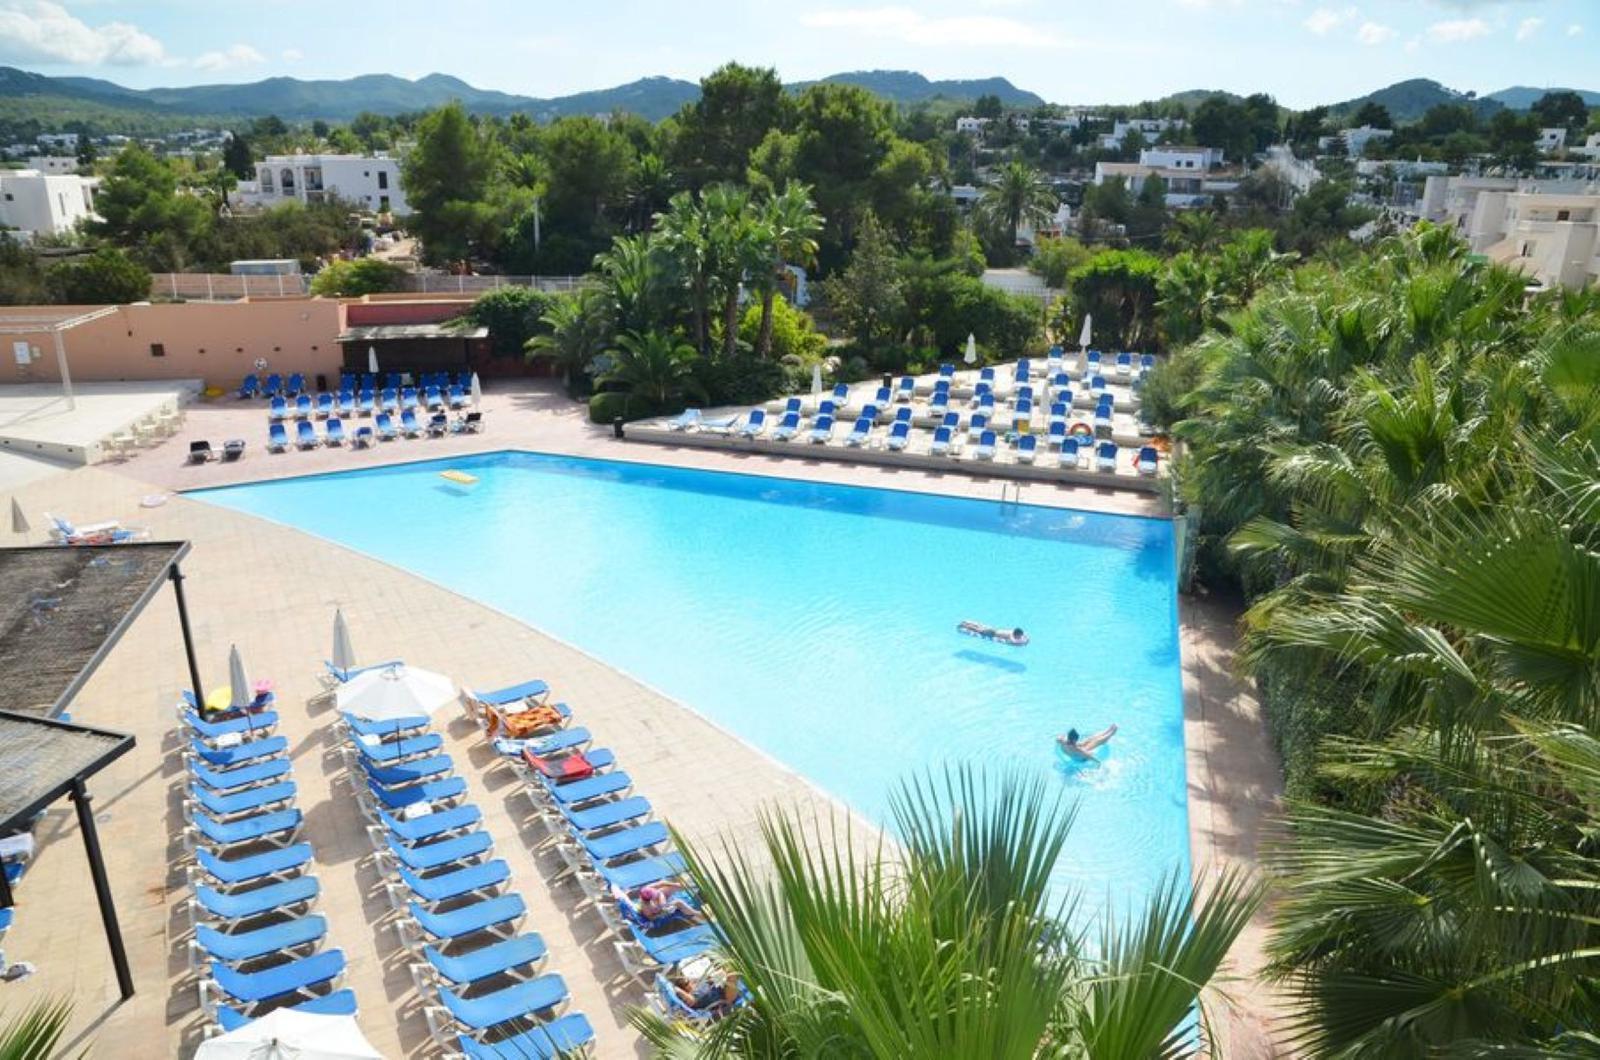 hoteles playa ibiza Bergantin_DSC_4436 (Large)